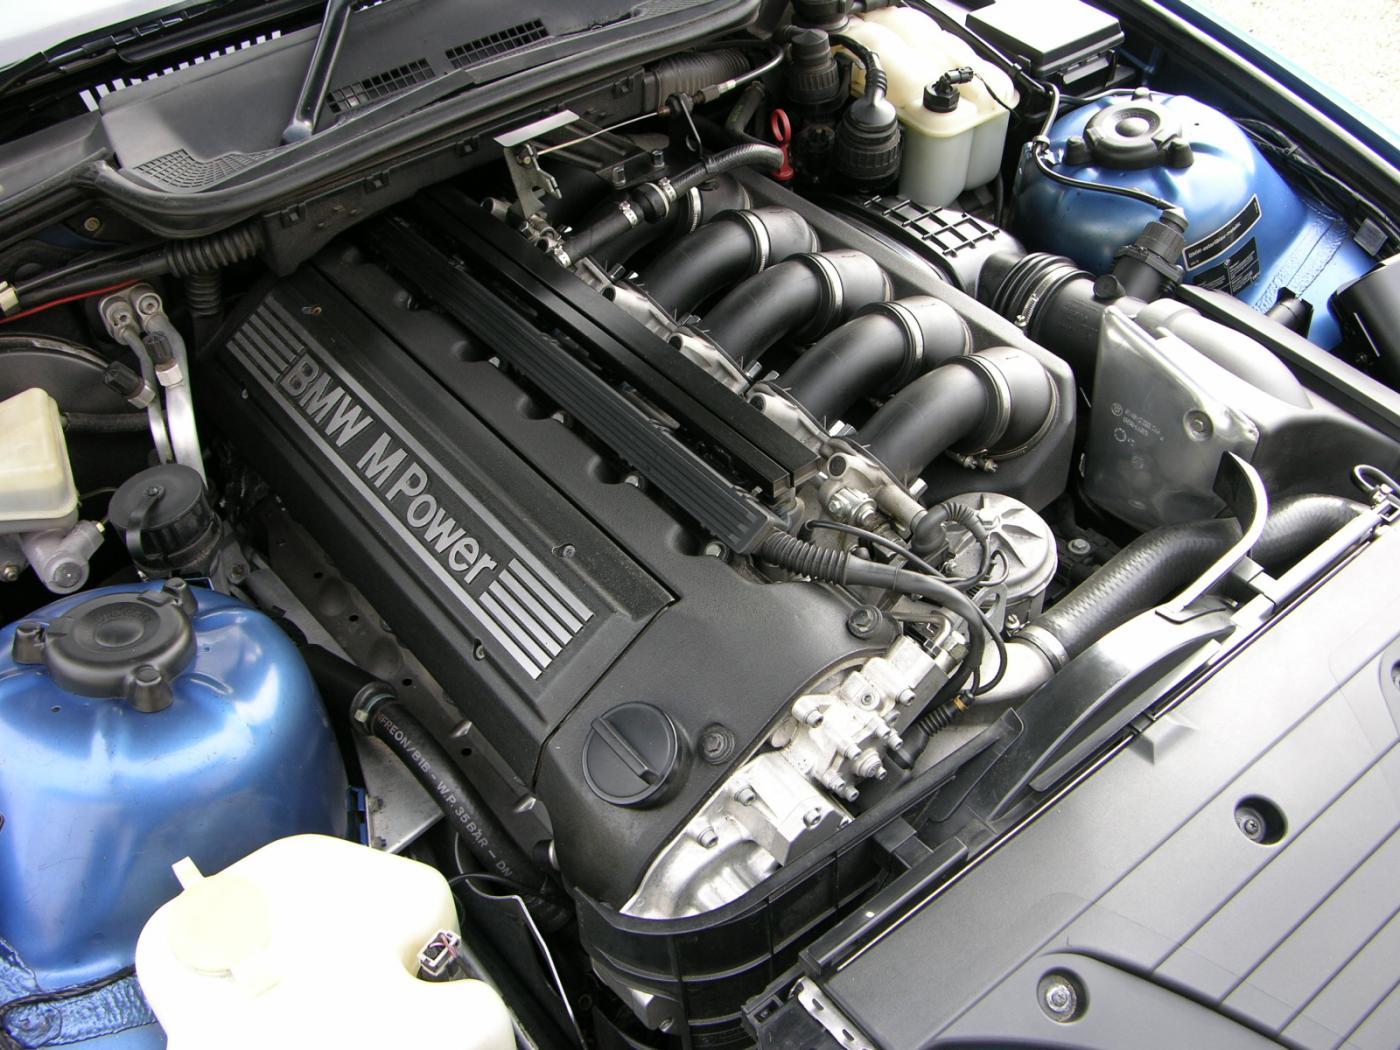 Moteurs-BMW-six-cylindres-en-ligne-9.jpeg